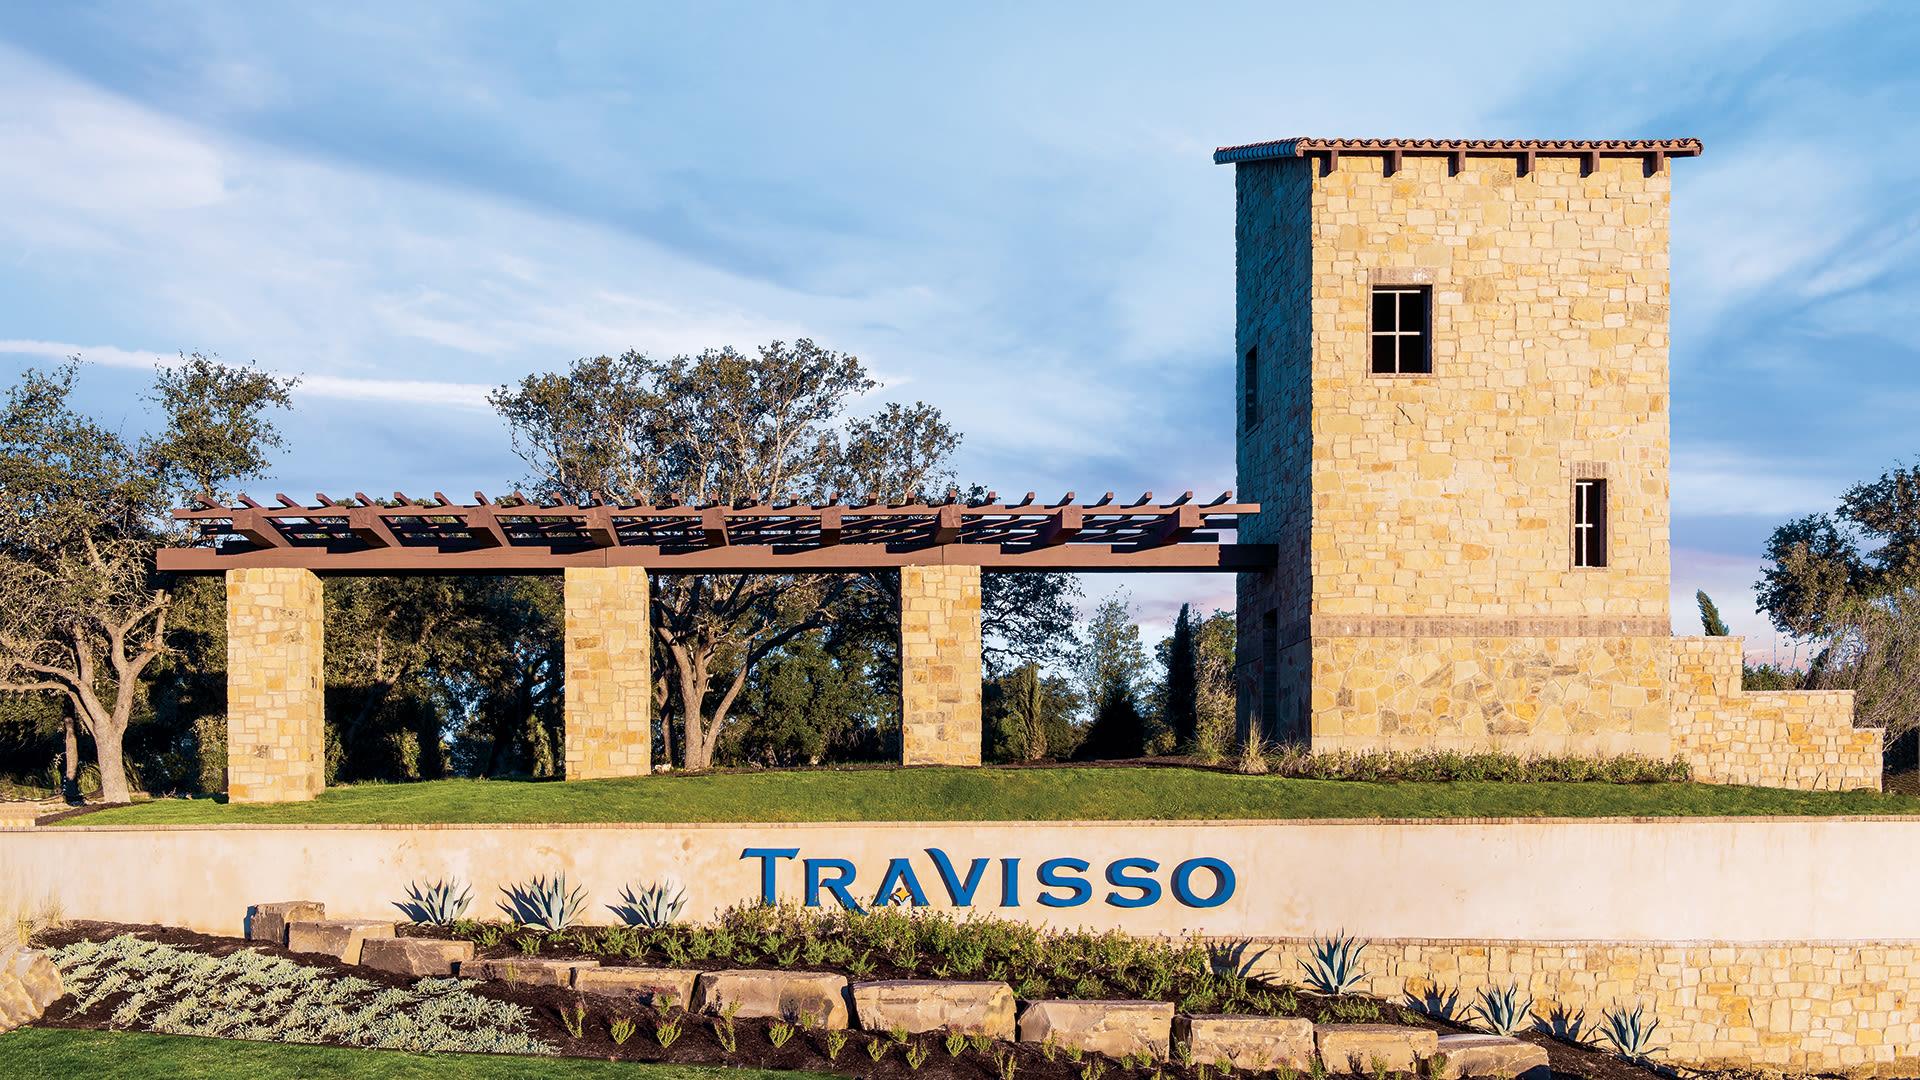 Travisso